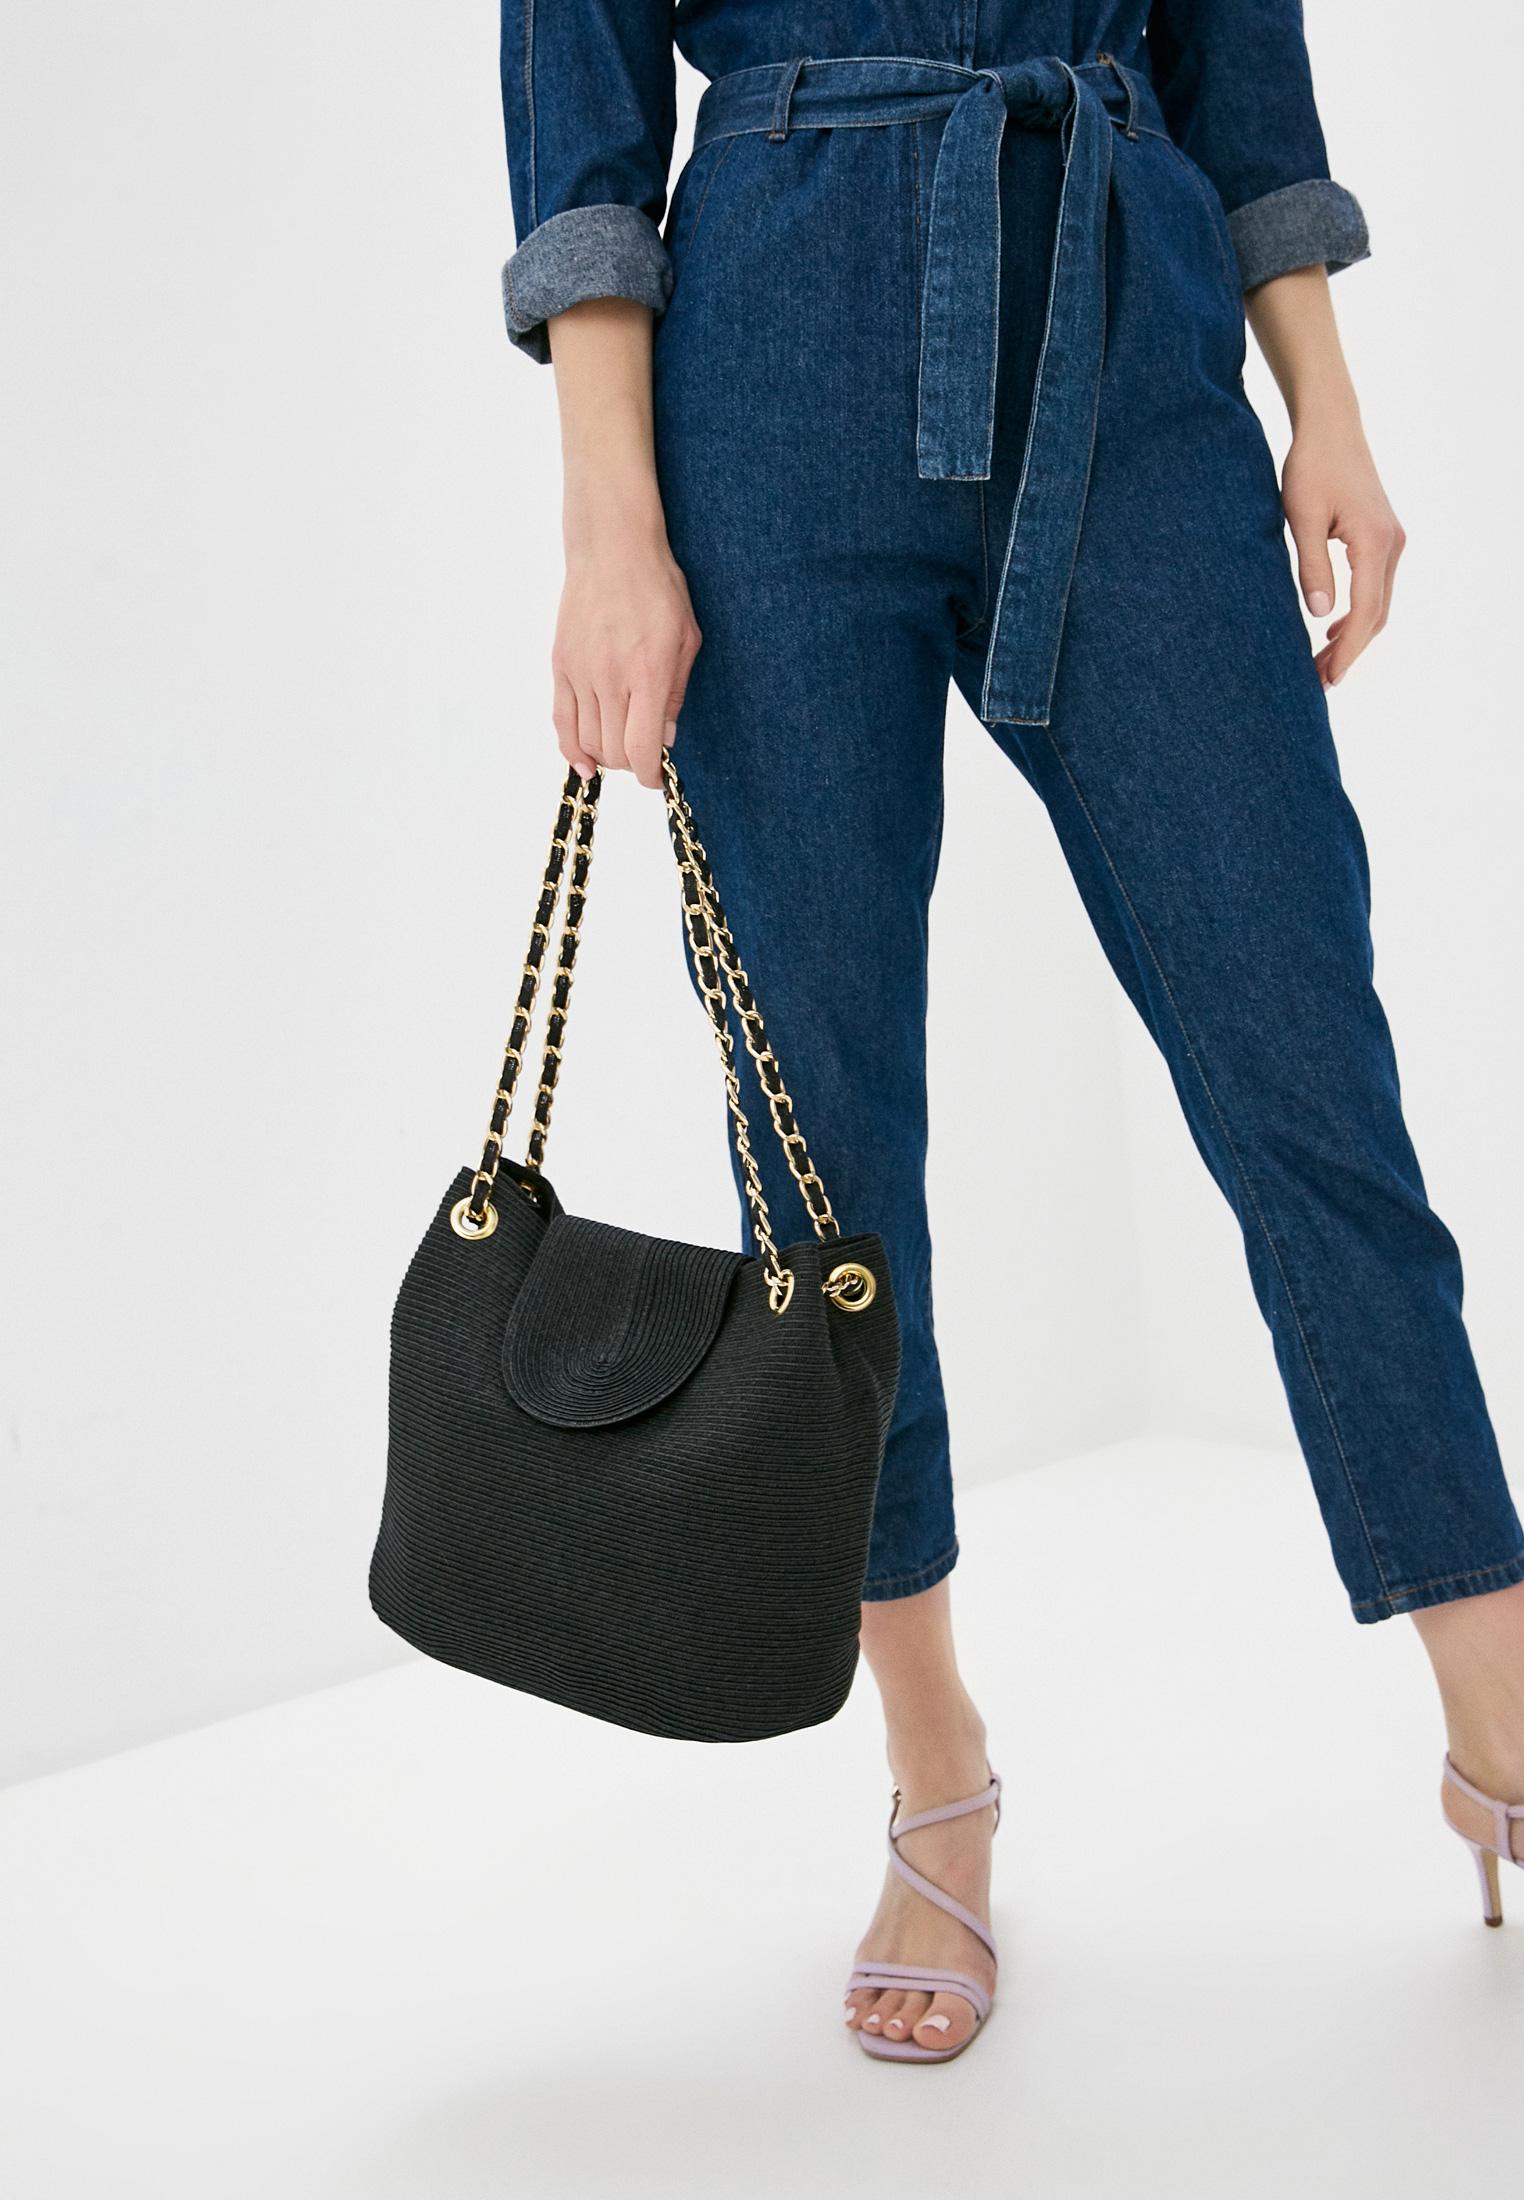 Пляжная сумка Fabretti GB1-2  black